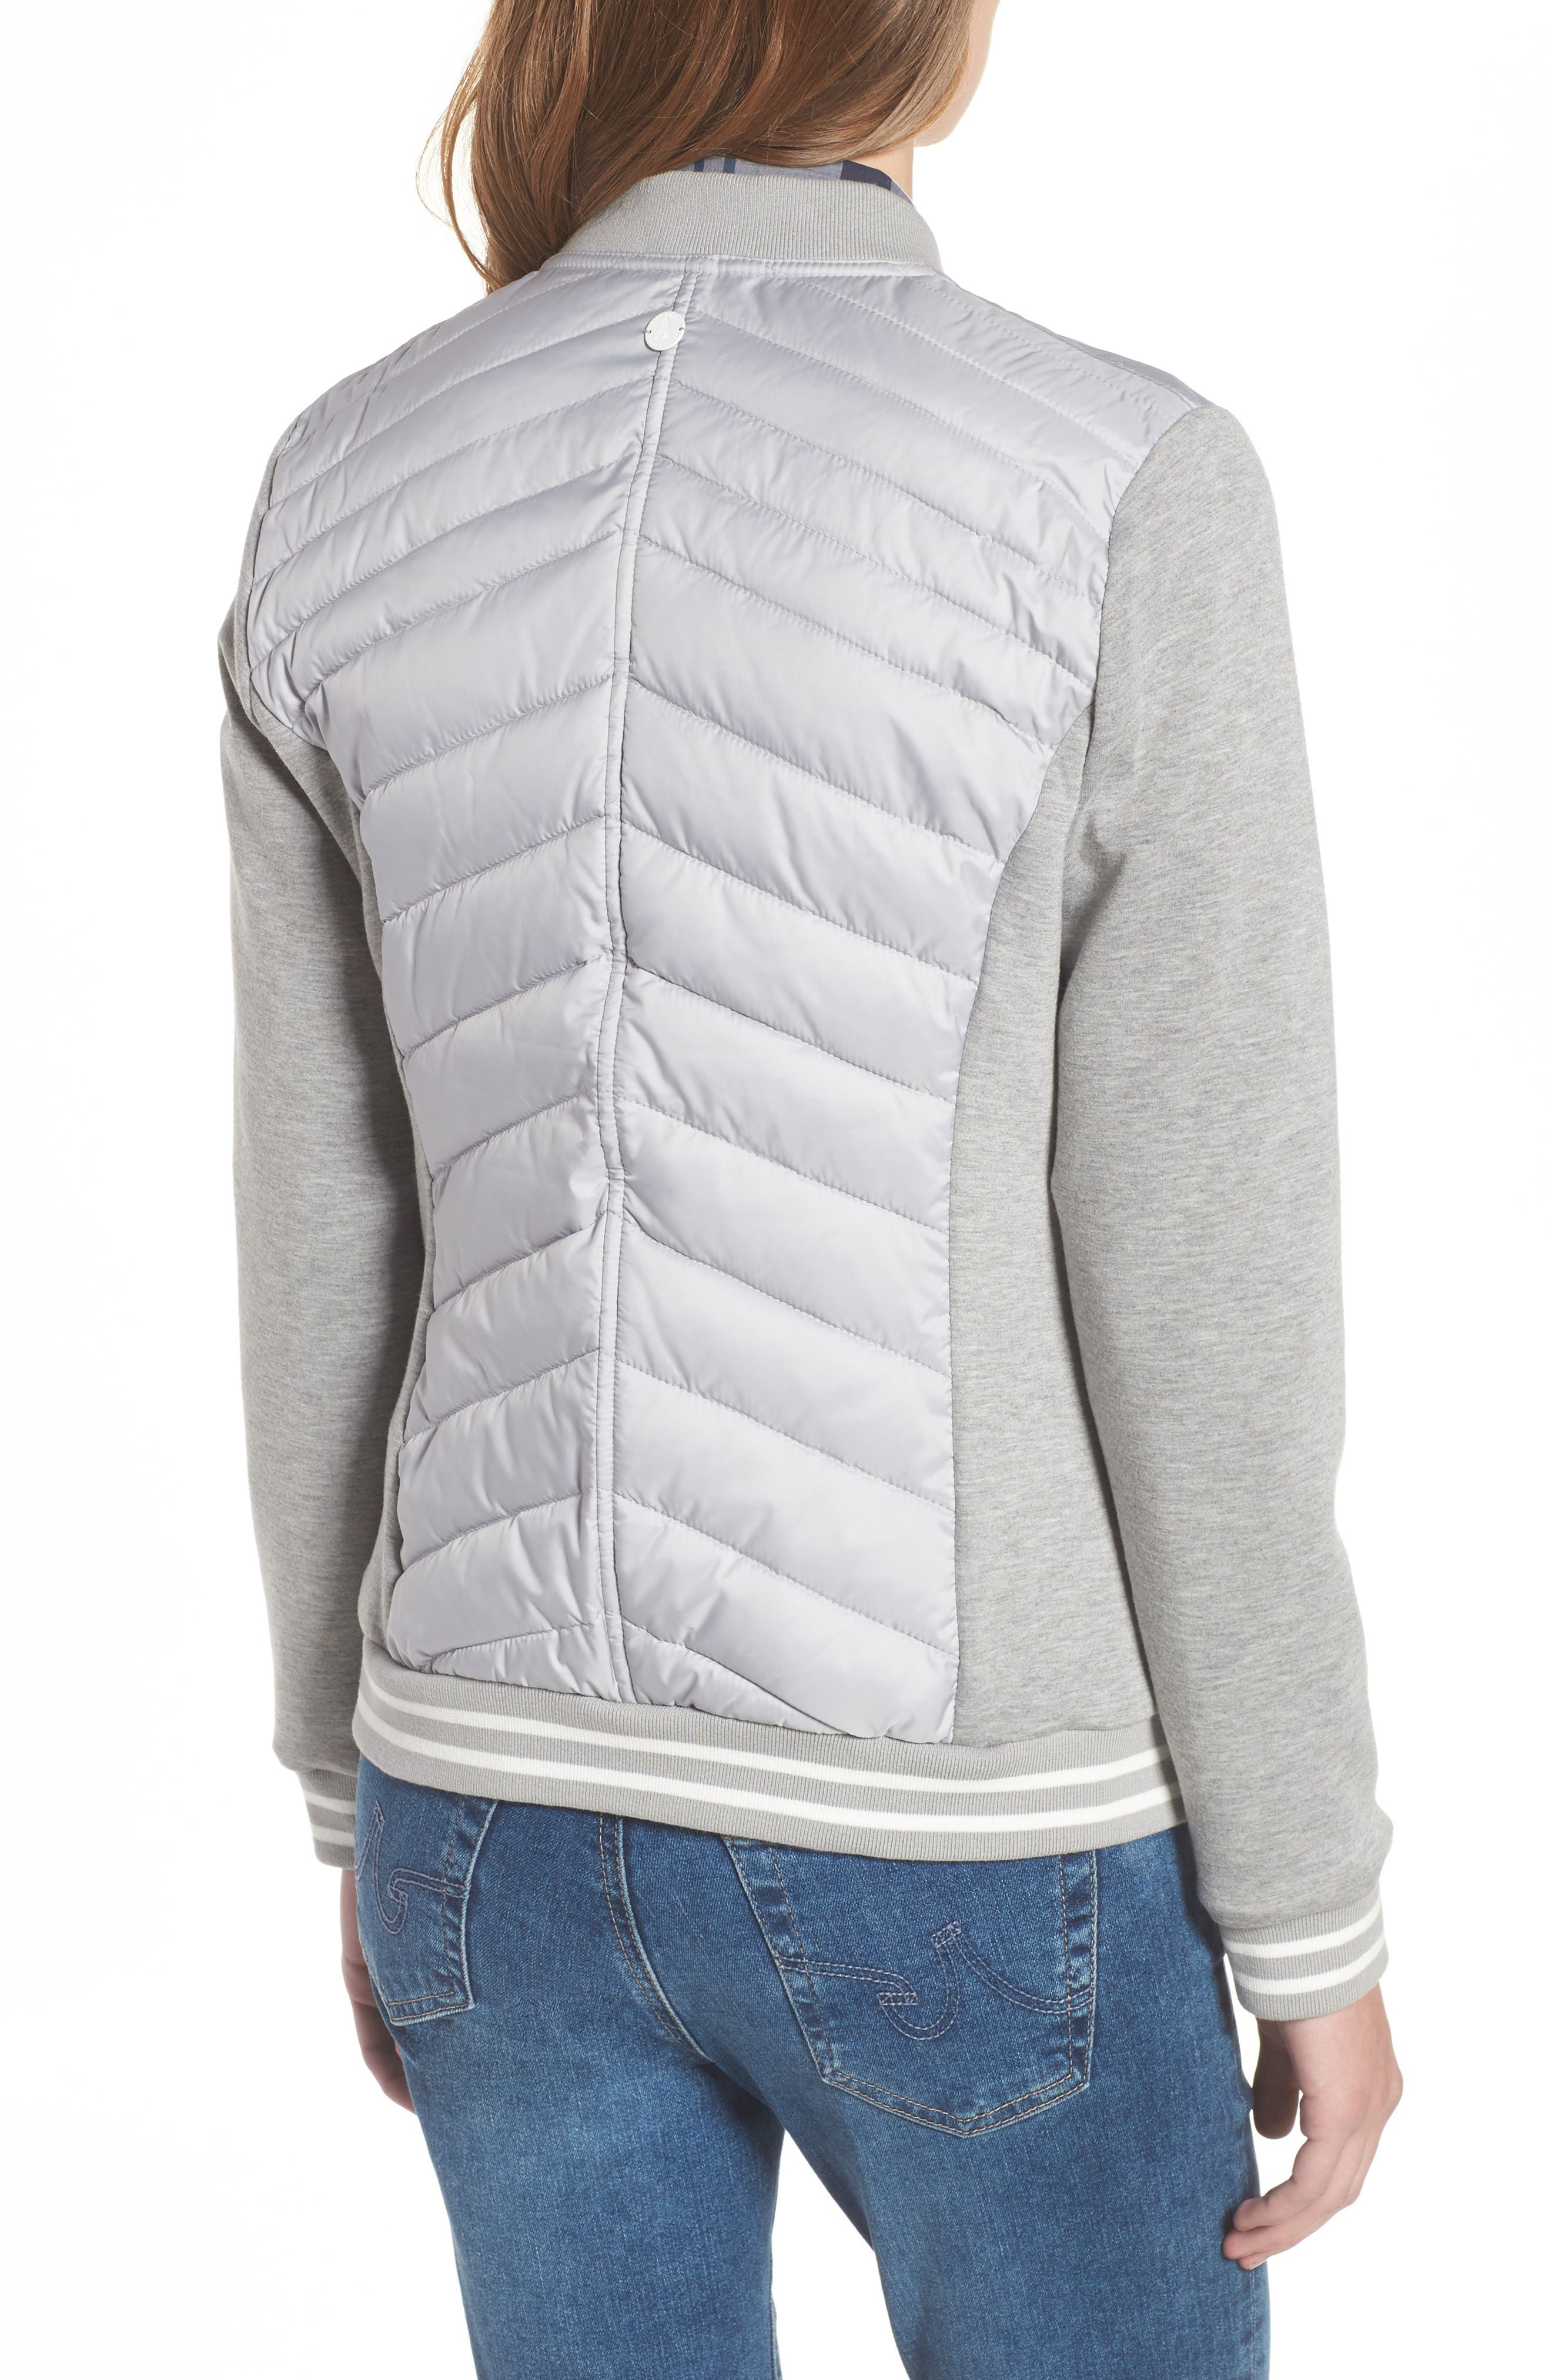 Pembrey Sweatshirt Jacket,                             Alternate thumbnail 2, color,                             Ice White